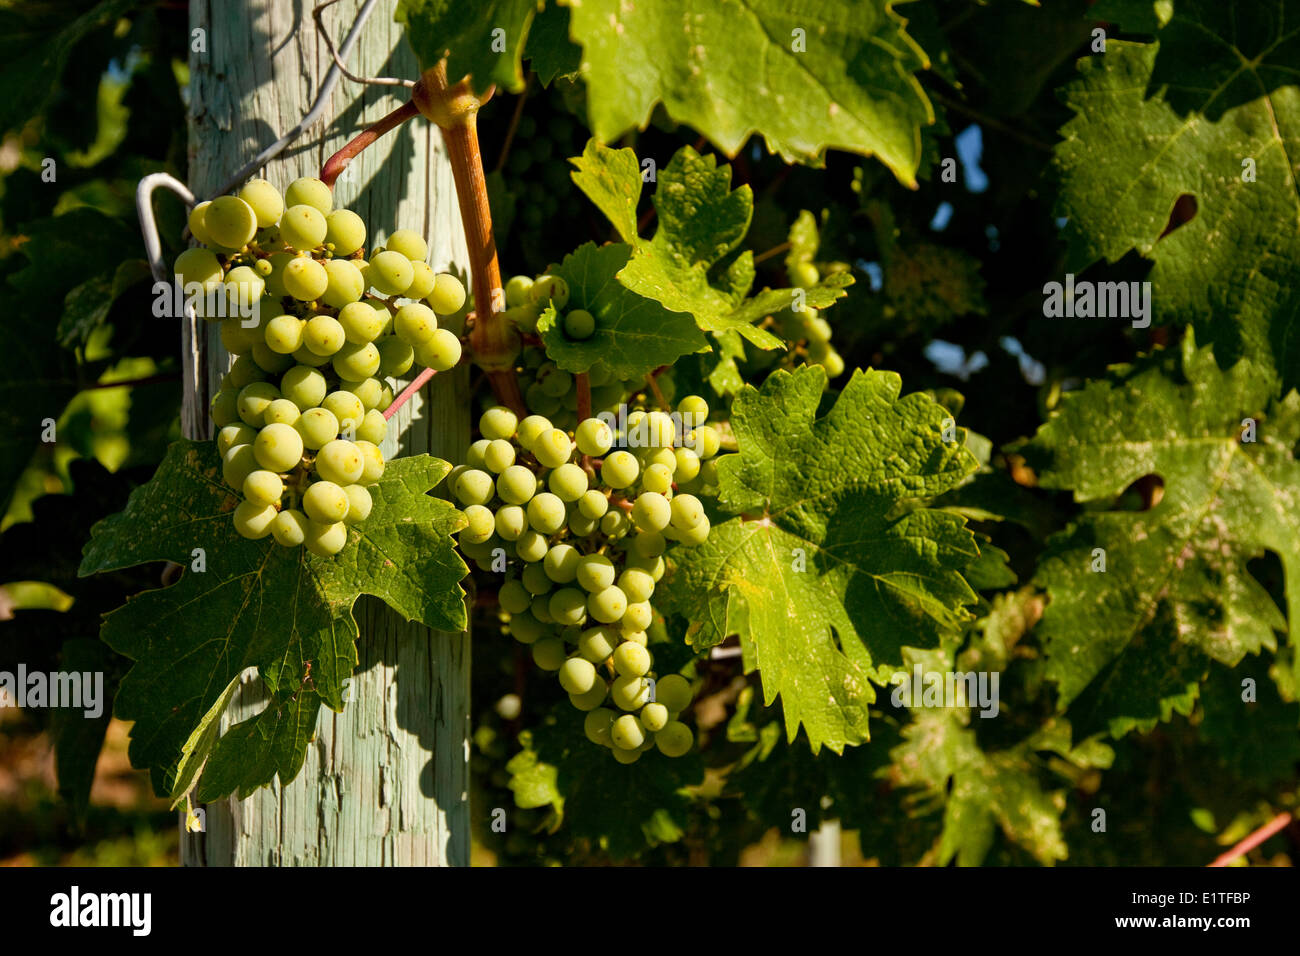 Young chardonnay grapes on vine, Meyer Family Vineyards, Okanagan Valley, British Columbia - Stock Image